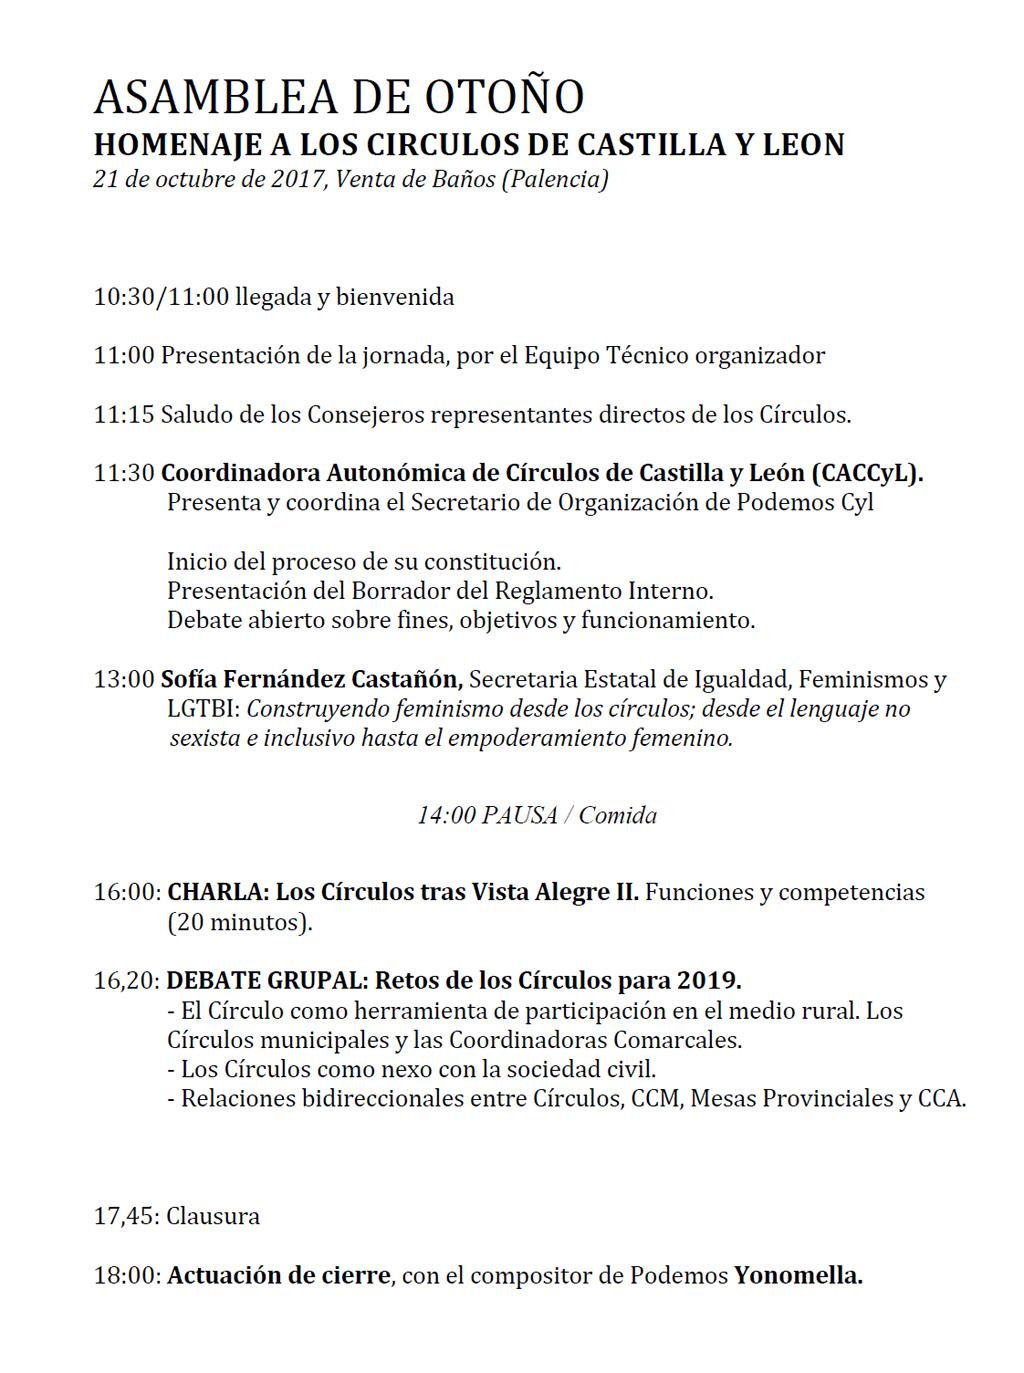 Asamblea-Otoño-2017-Venta-Baños-Programa